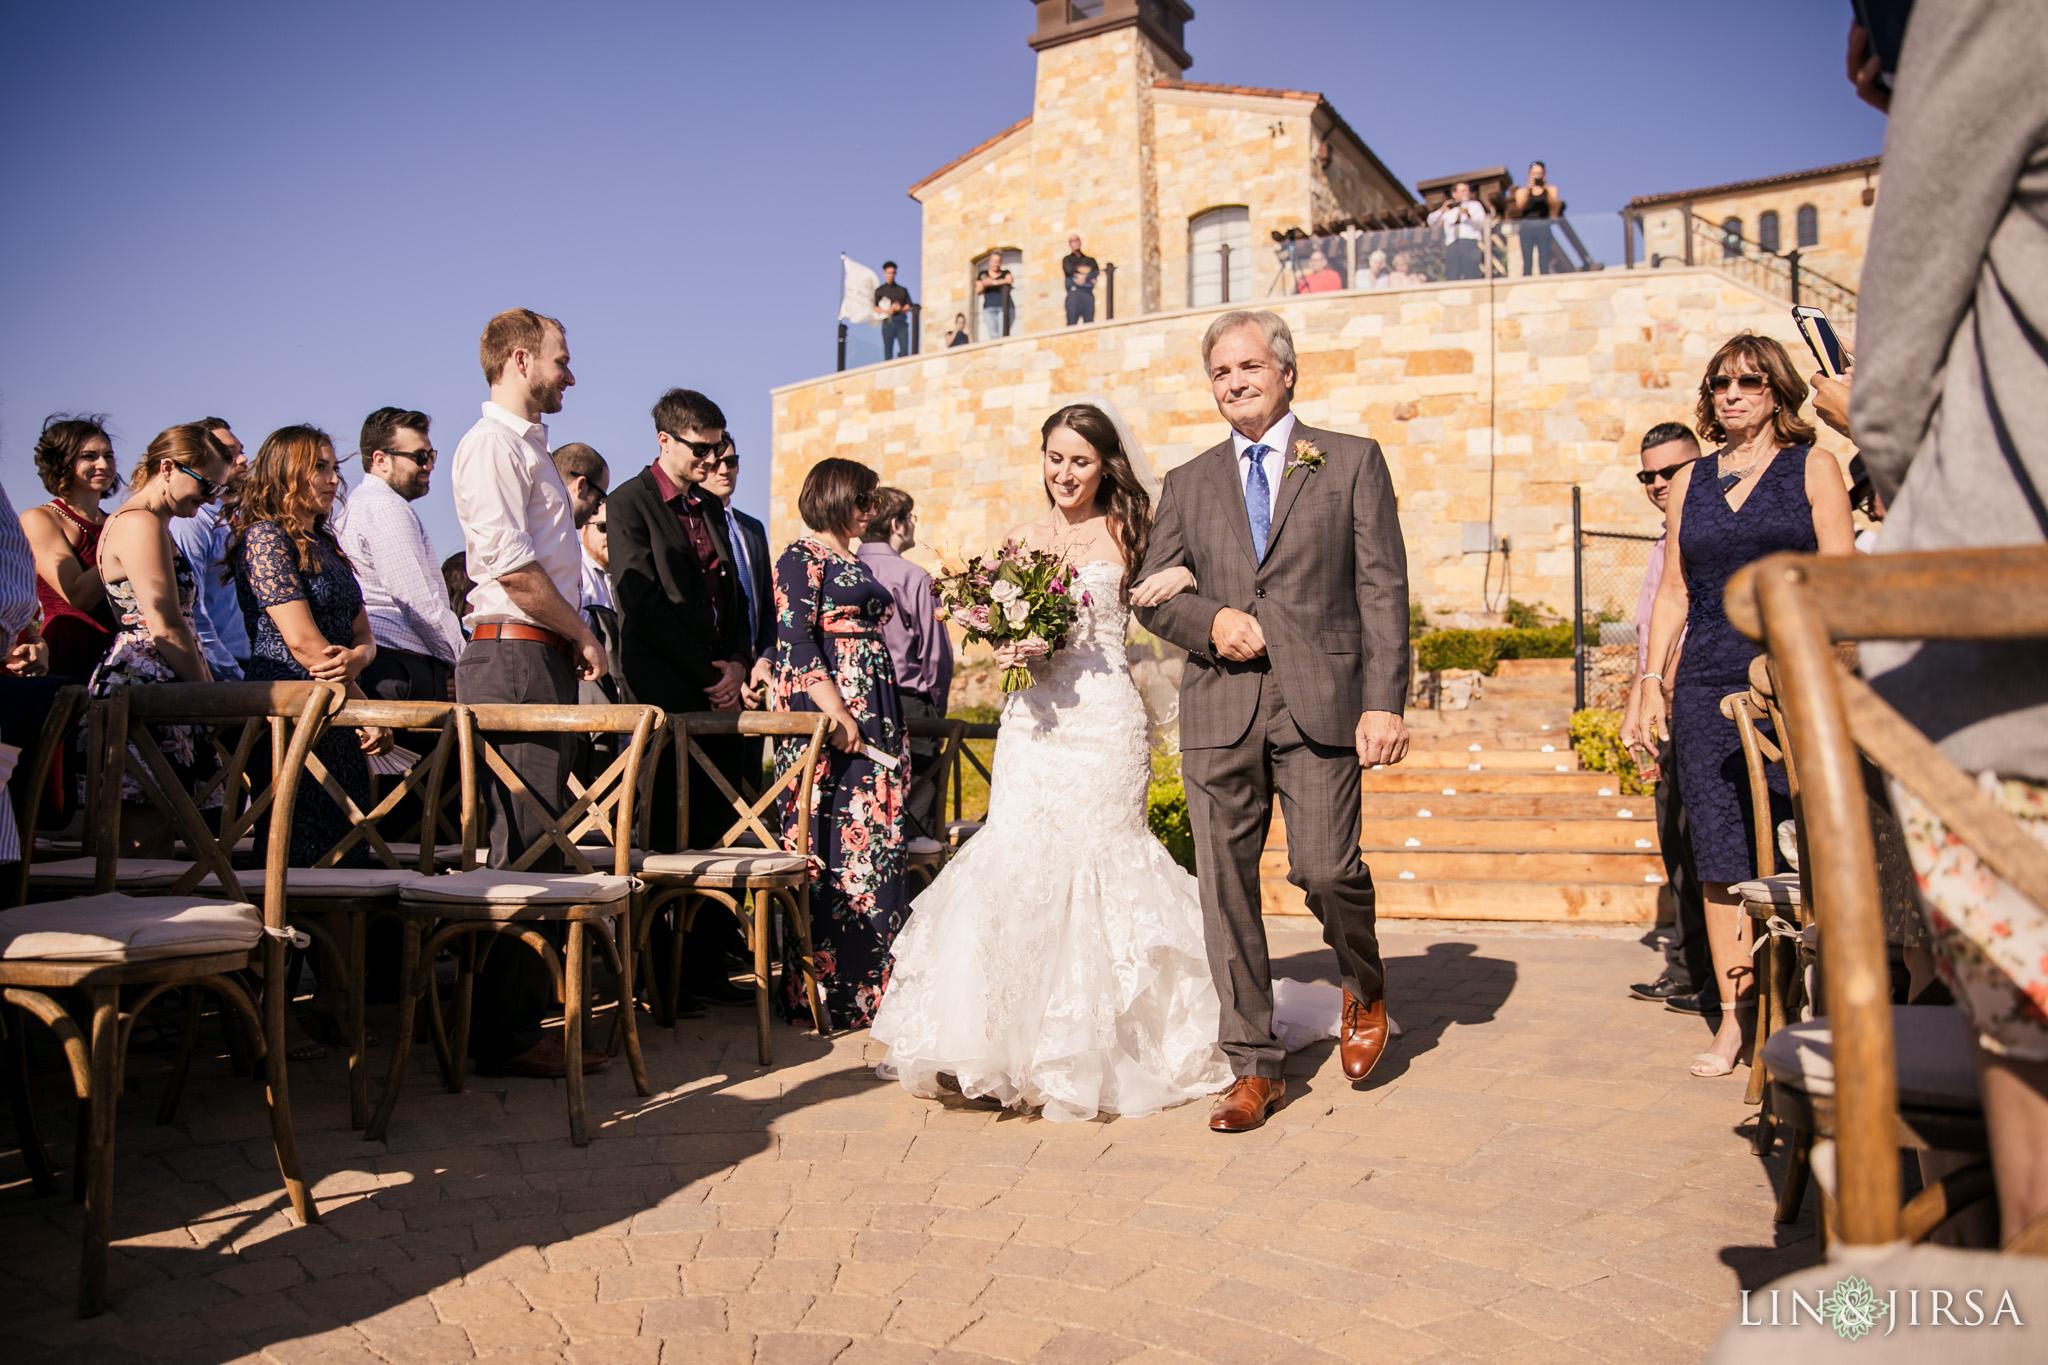 016 malibu rocky oaks wedding photography